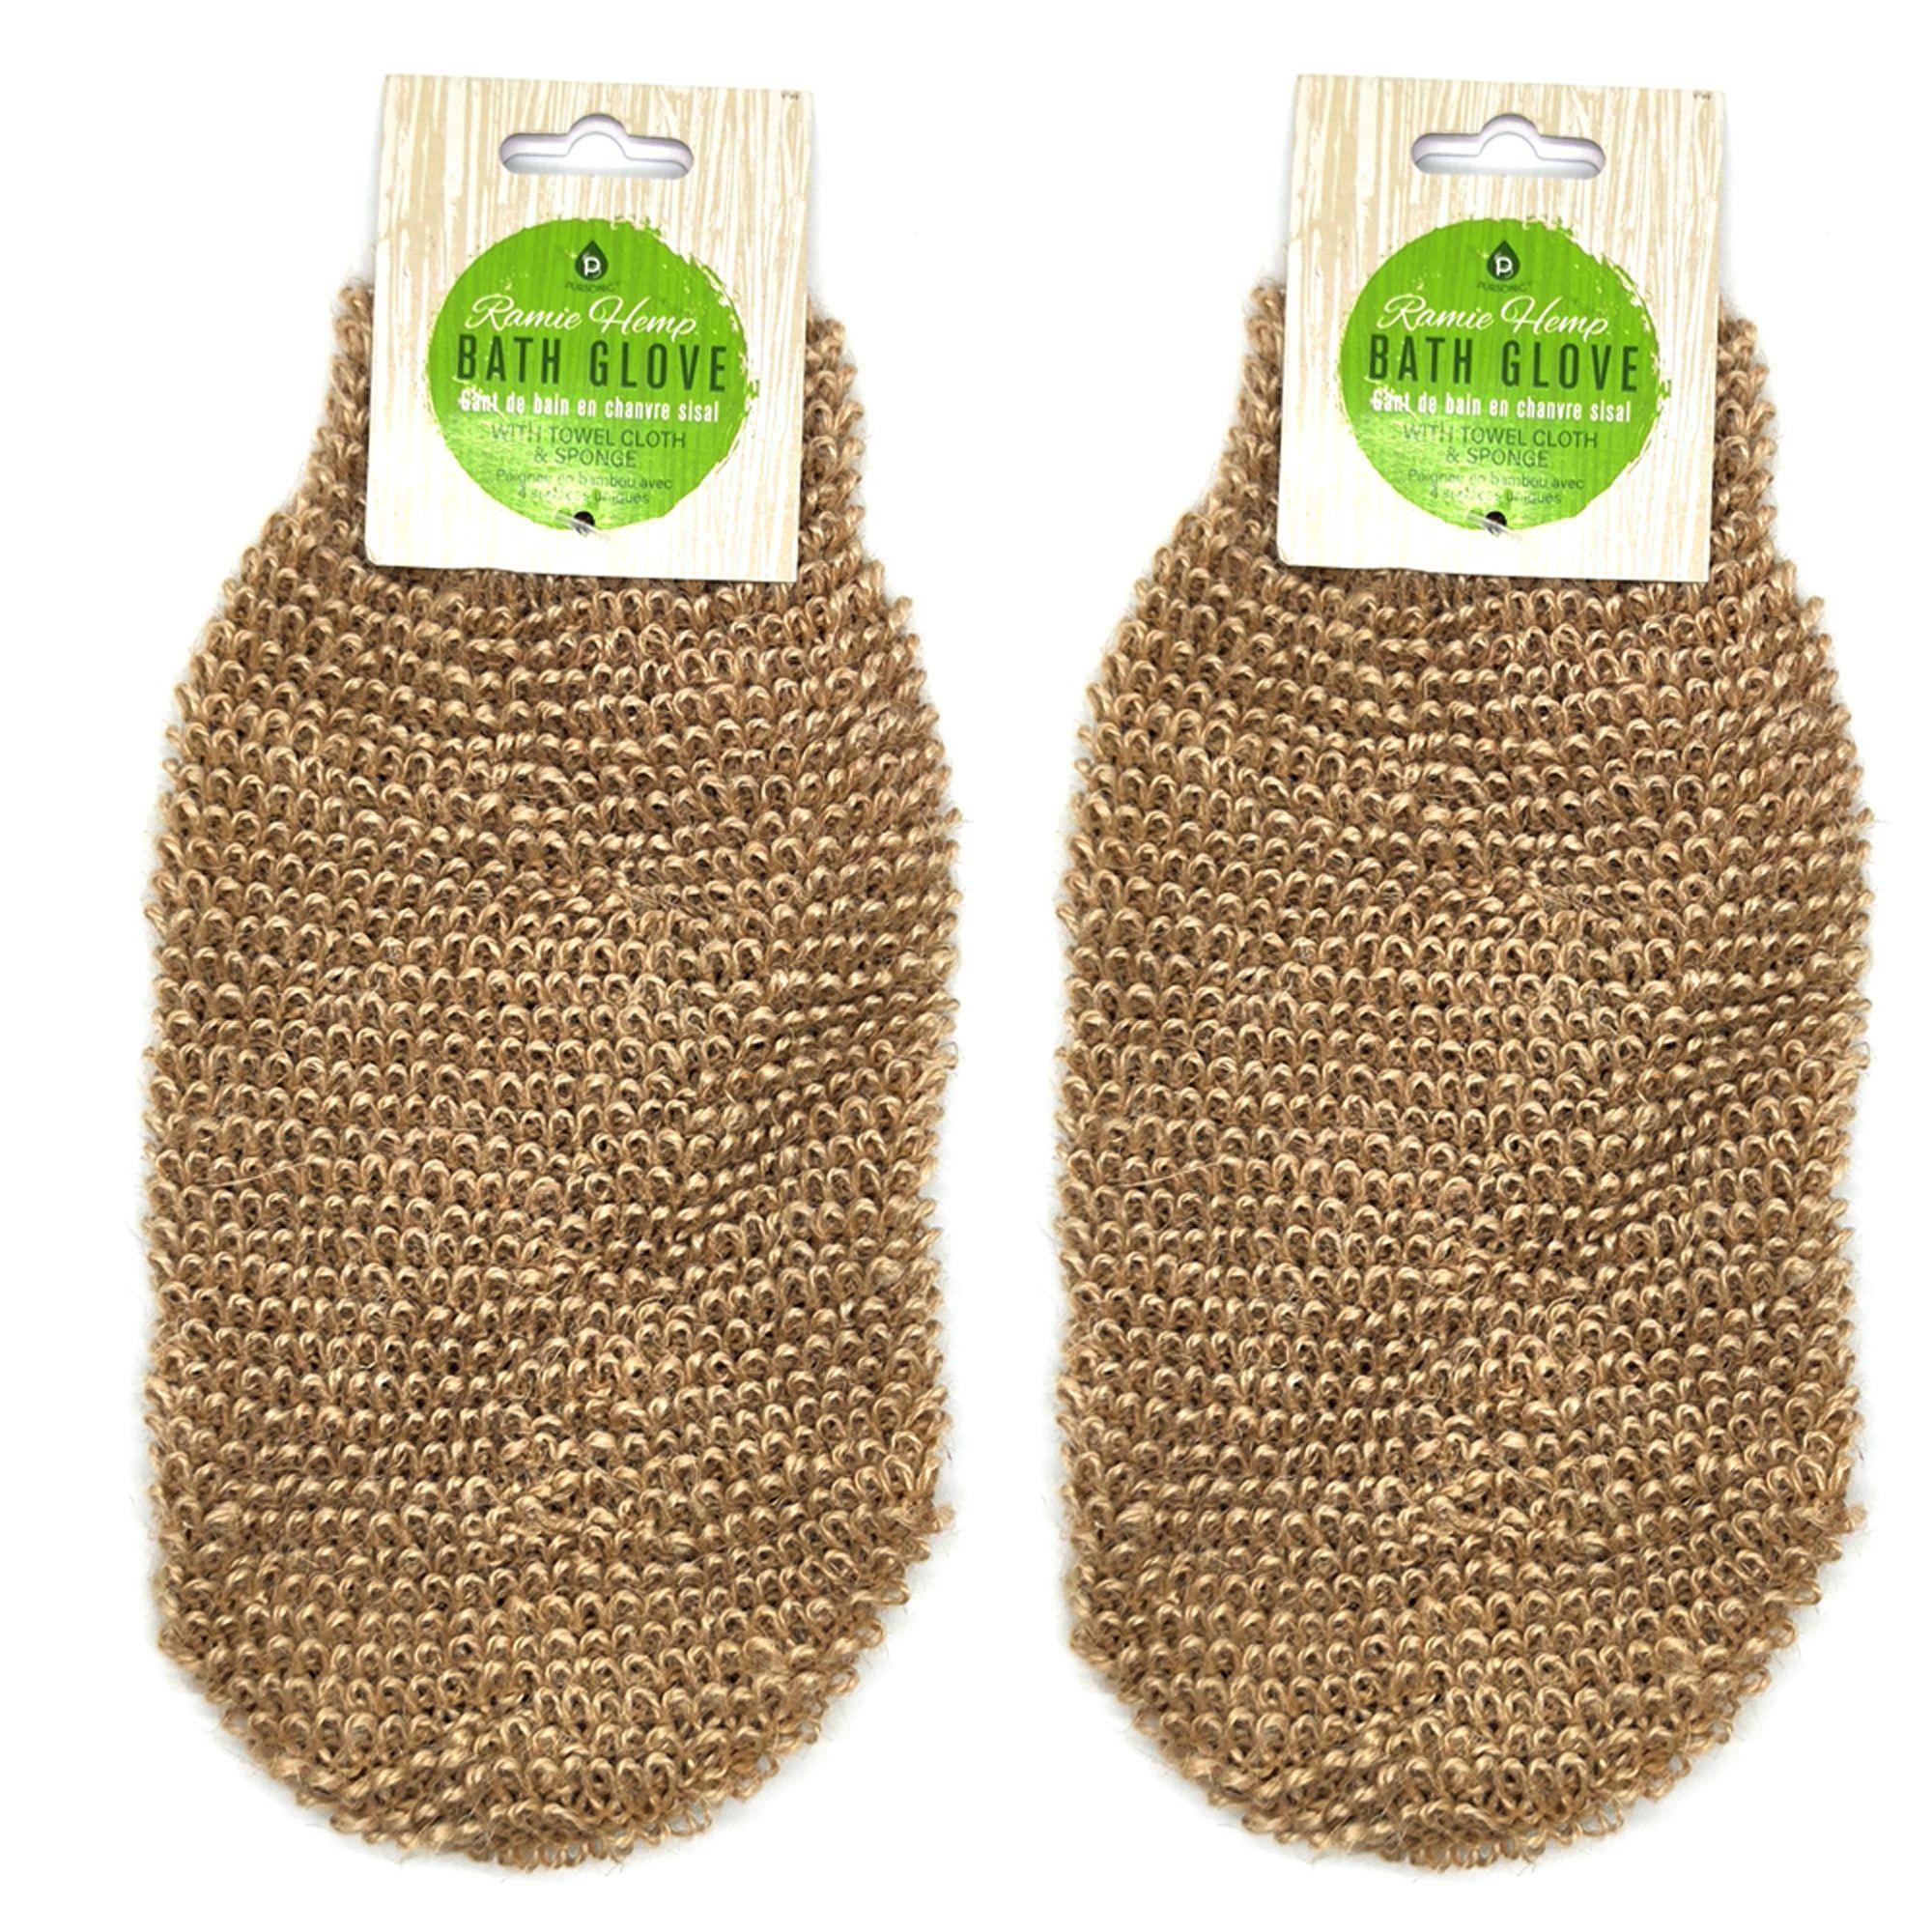 Pursonic BG36 Bath Glove with Towel Clothe & Sponge, Natural